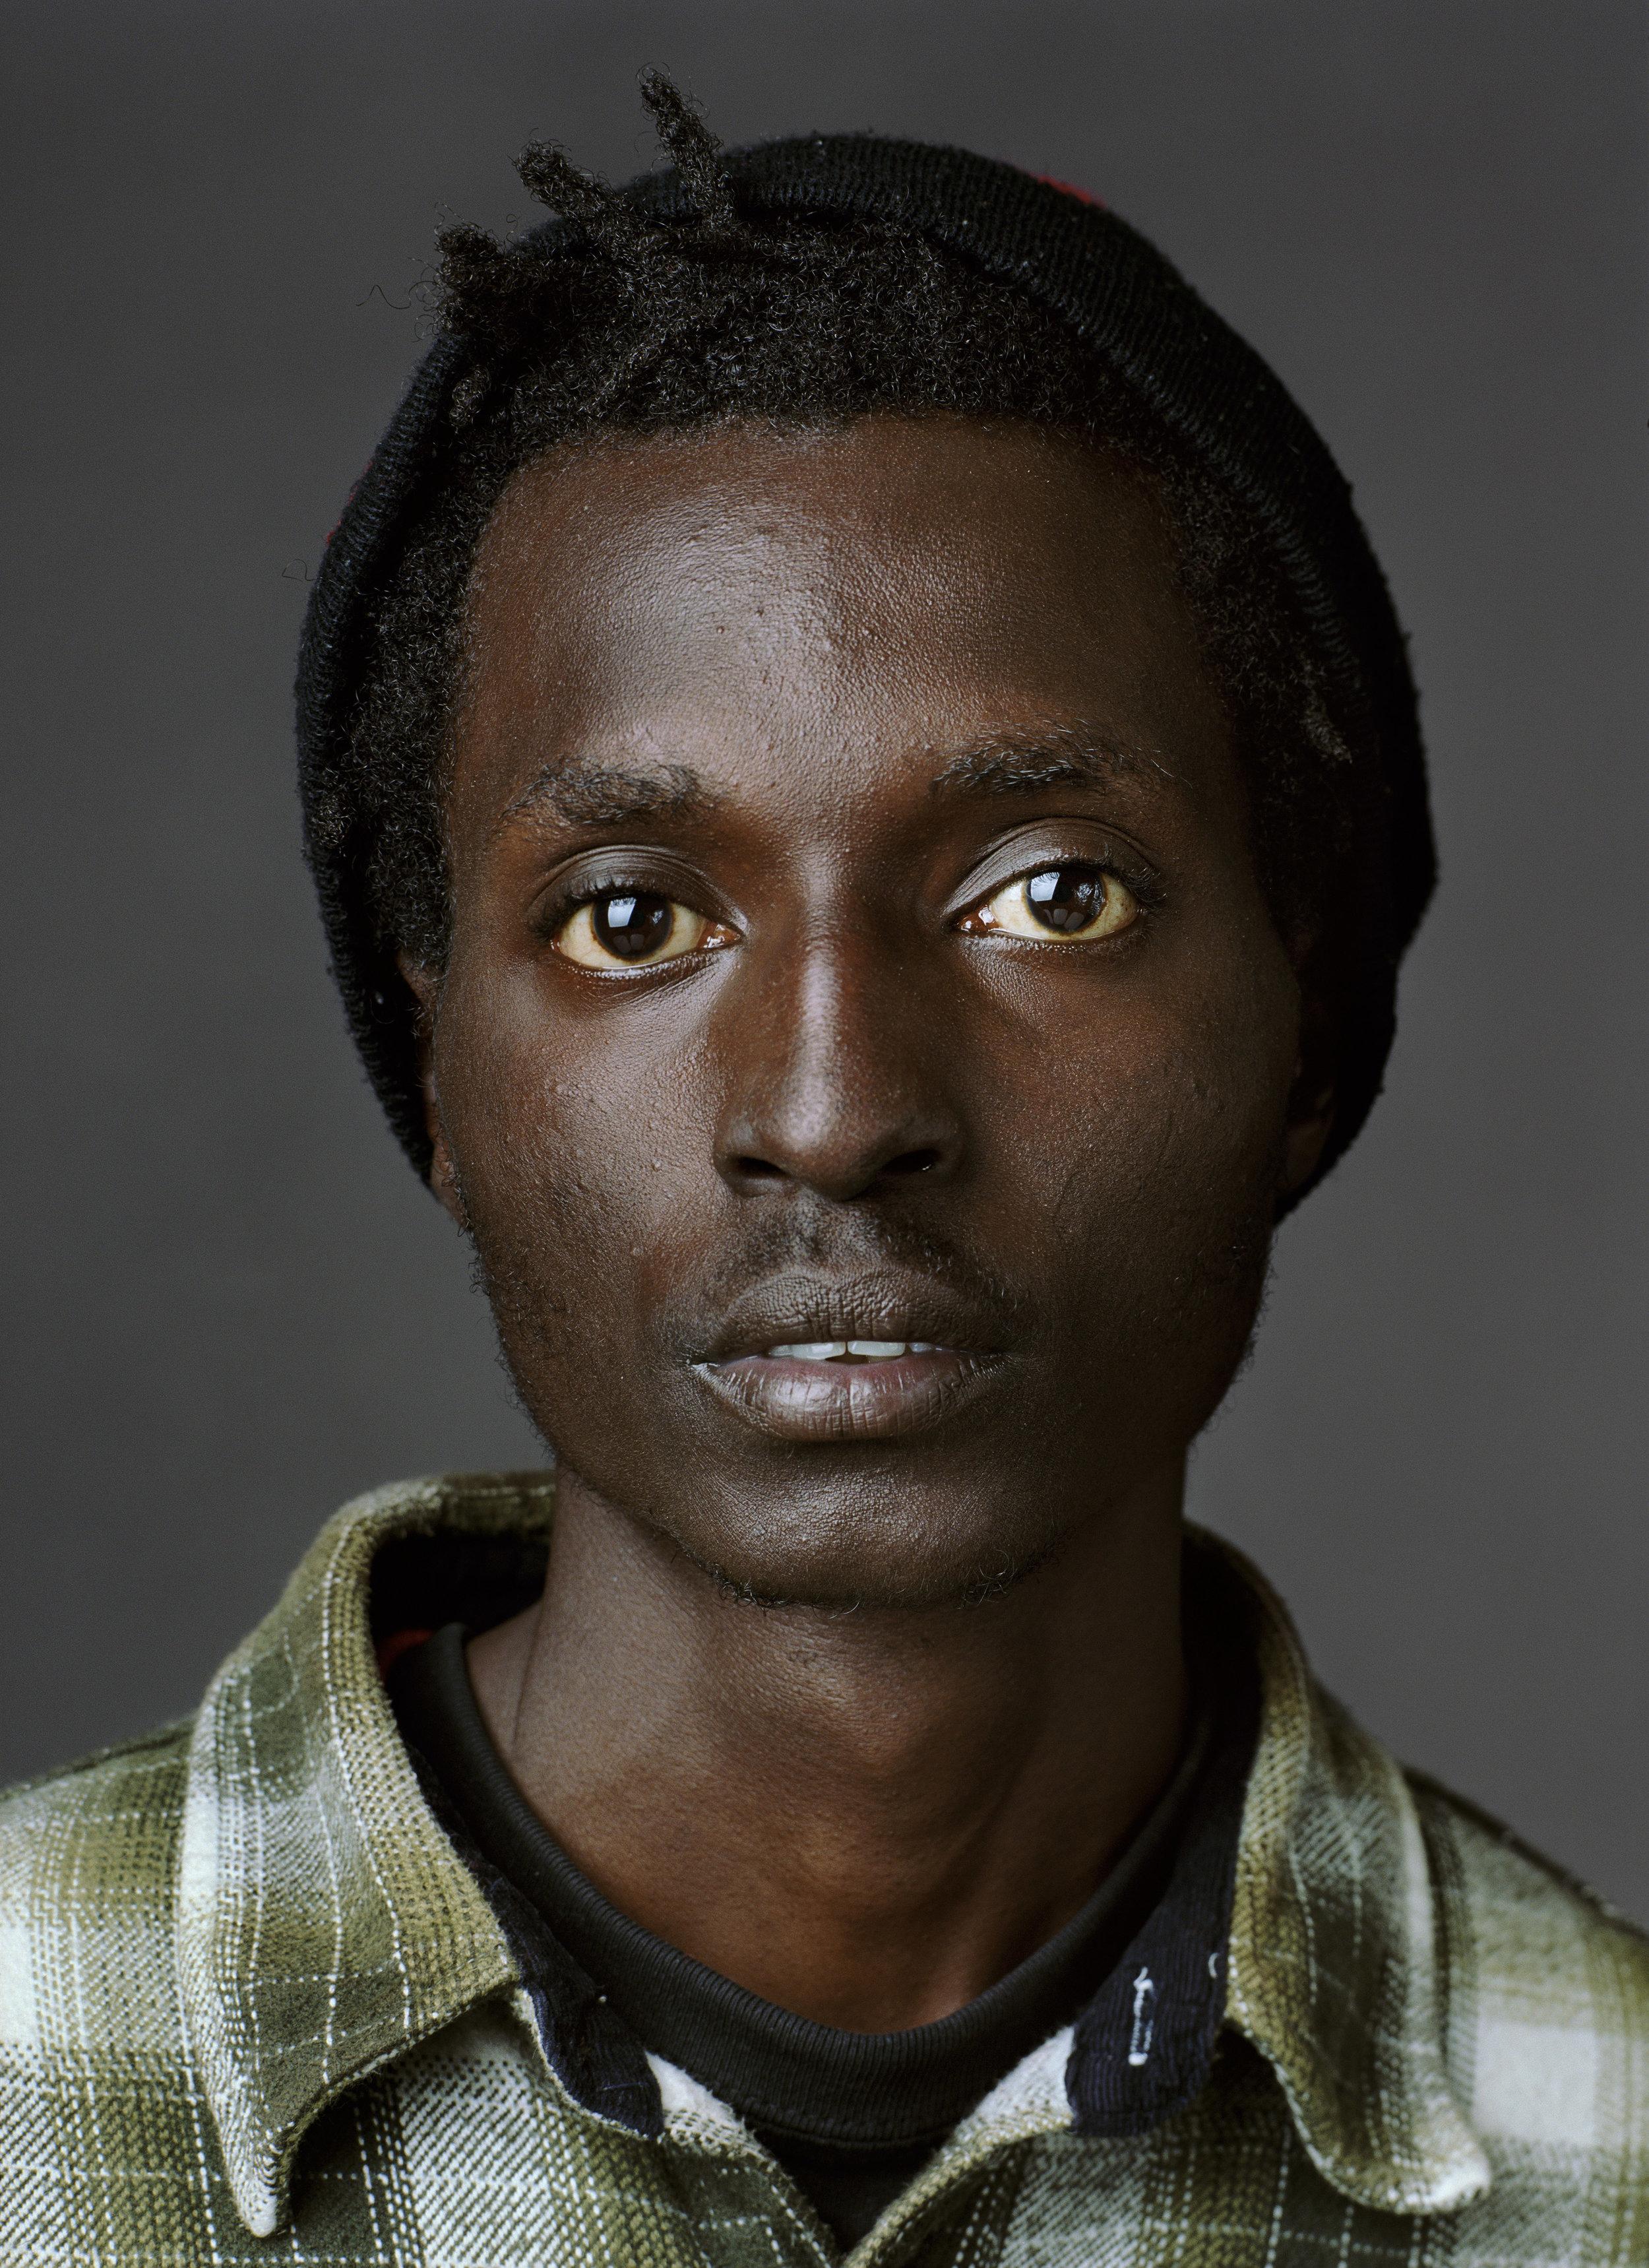 Knitzer (b. Nairobi, Kenya, 1987), photographed in Atlanta GA., april 2011. © Jan Banning